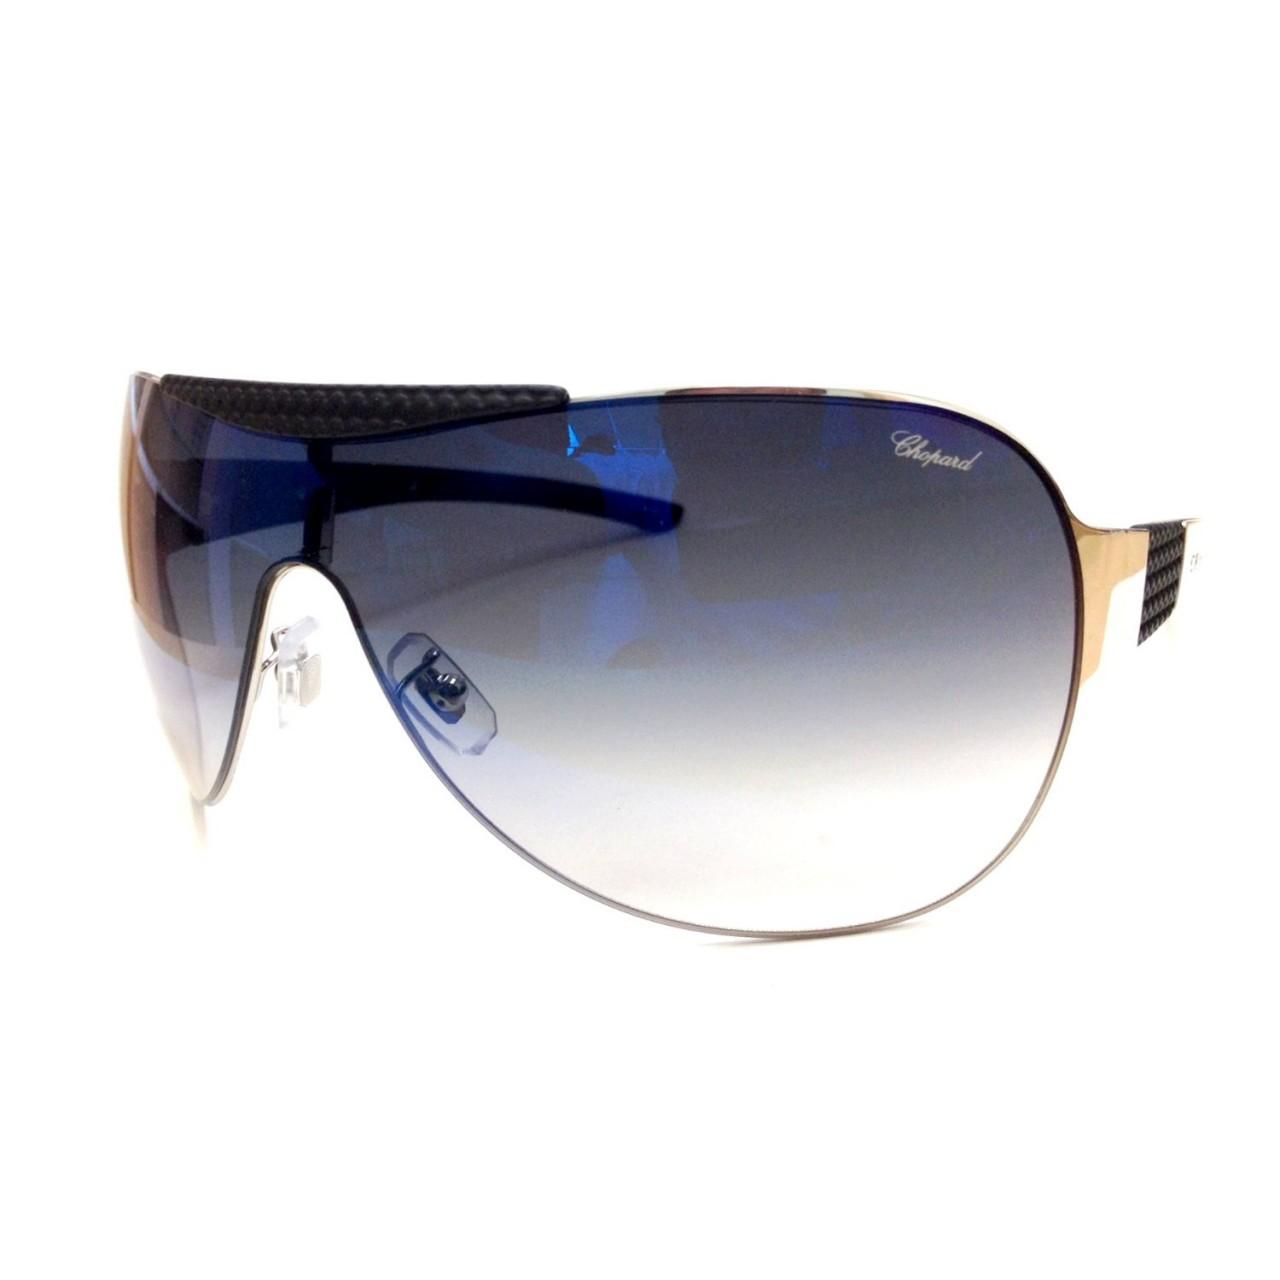 Pakistan Home Shopping Chopard Sch In 704 Sunglasses Price Aq3RjL54